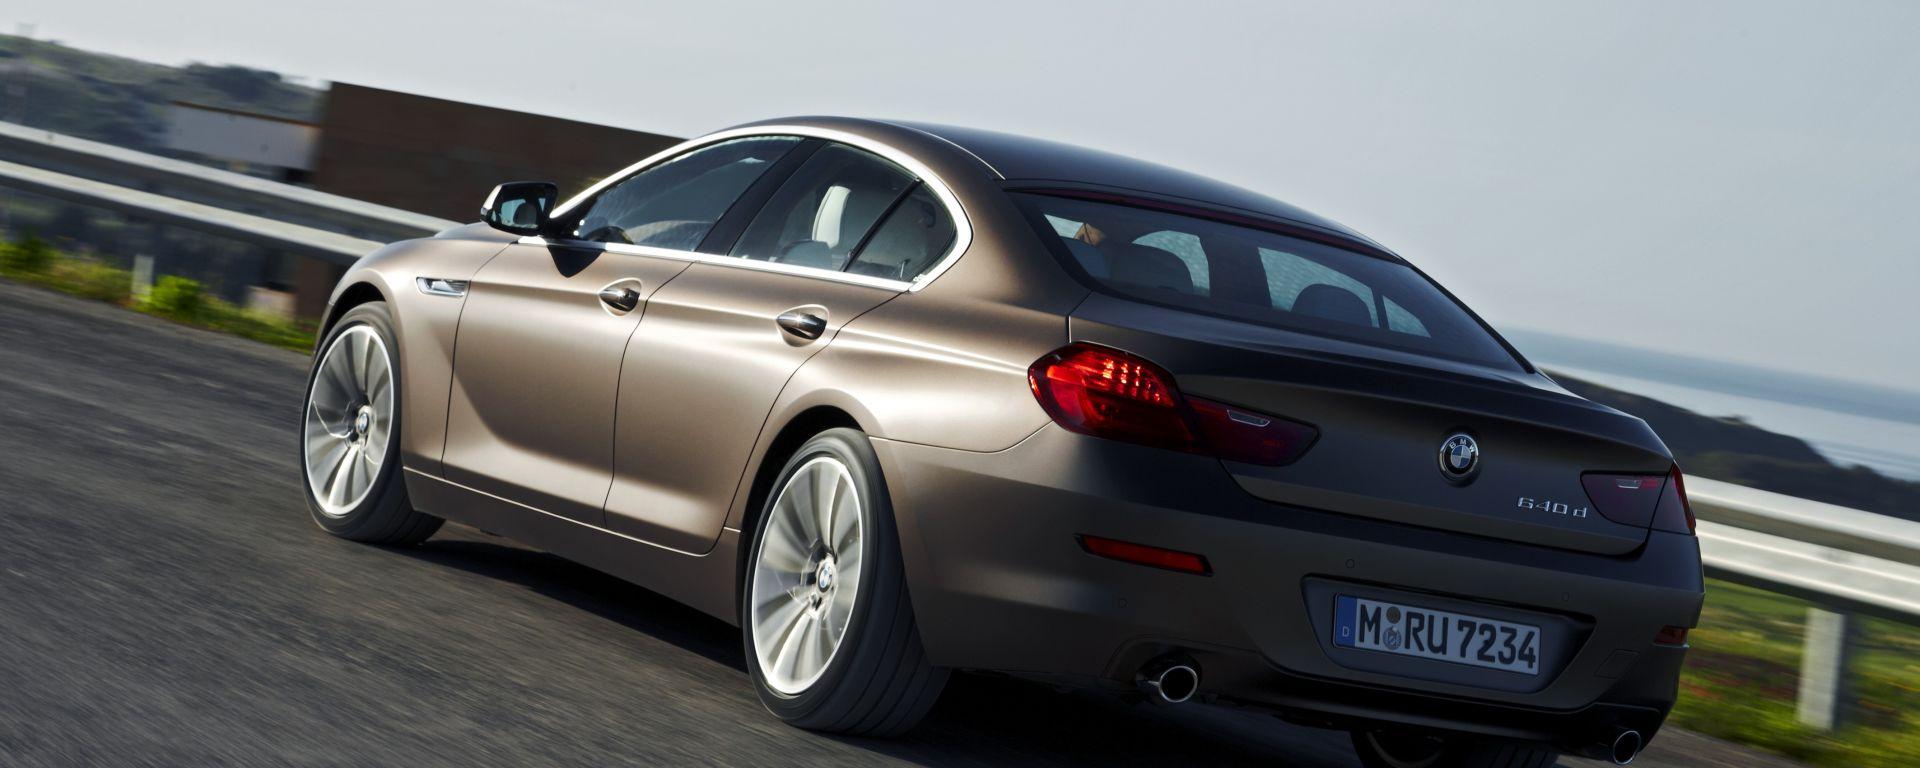 BMW Serie 6 Gran Coupé, ora anche in video